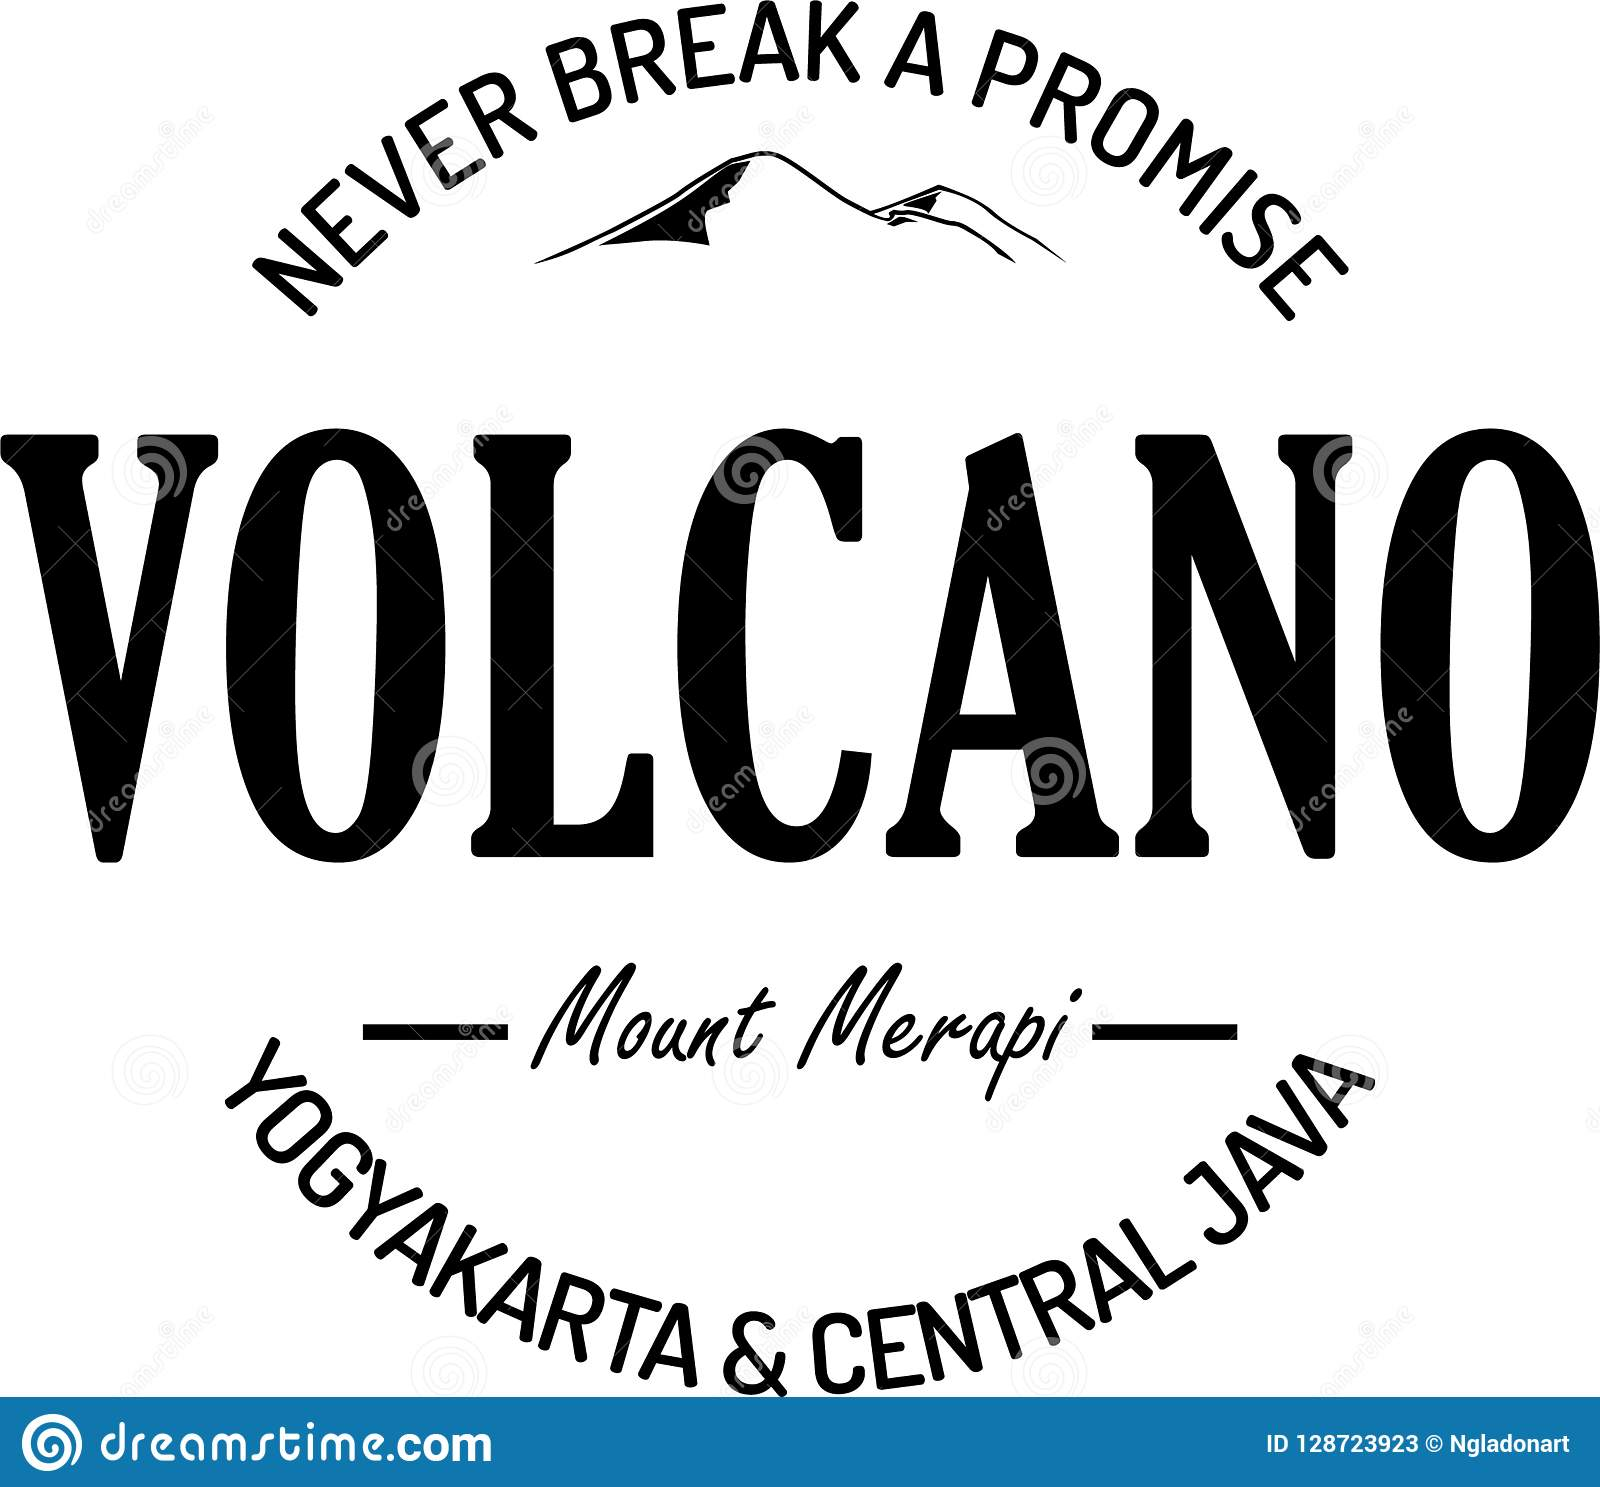 Never break a promise vintage logo